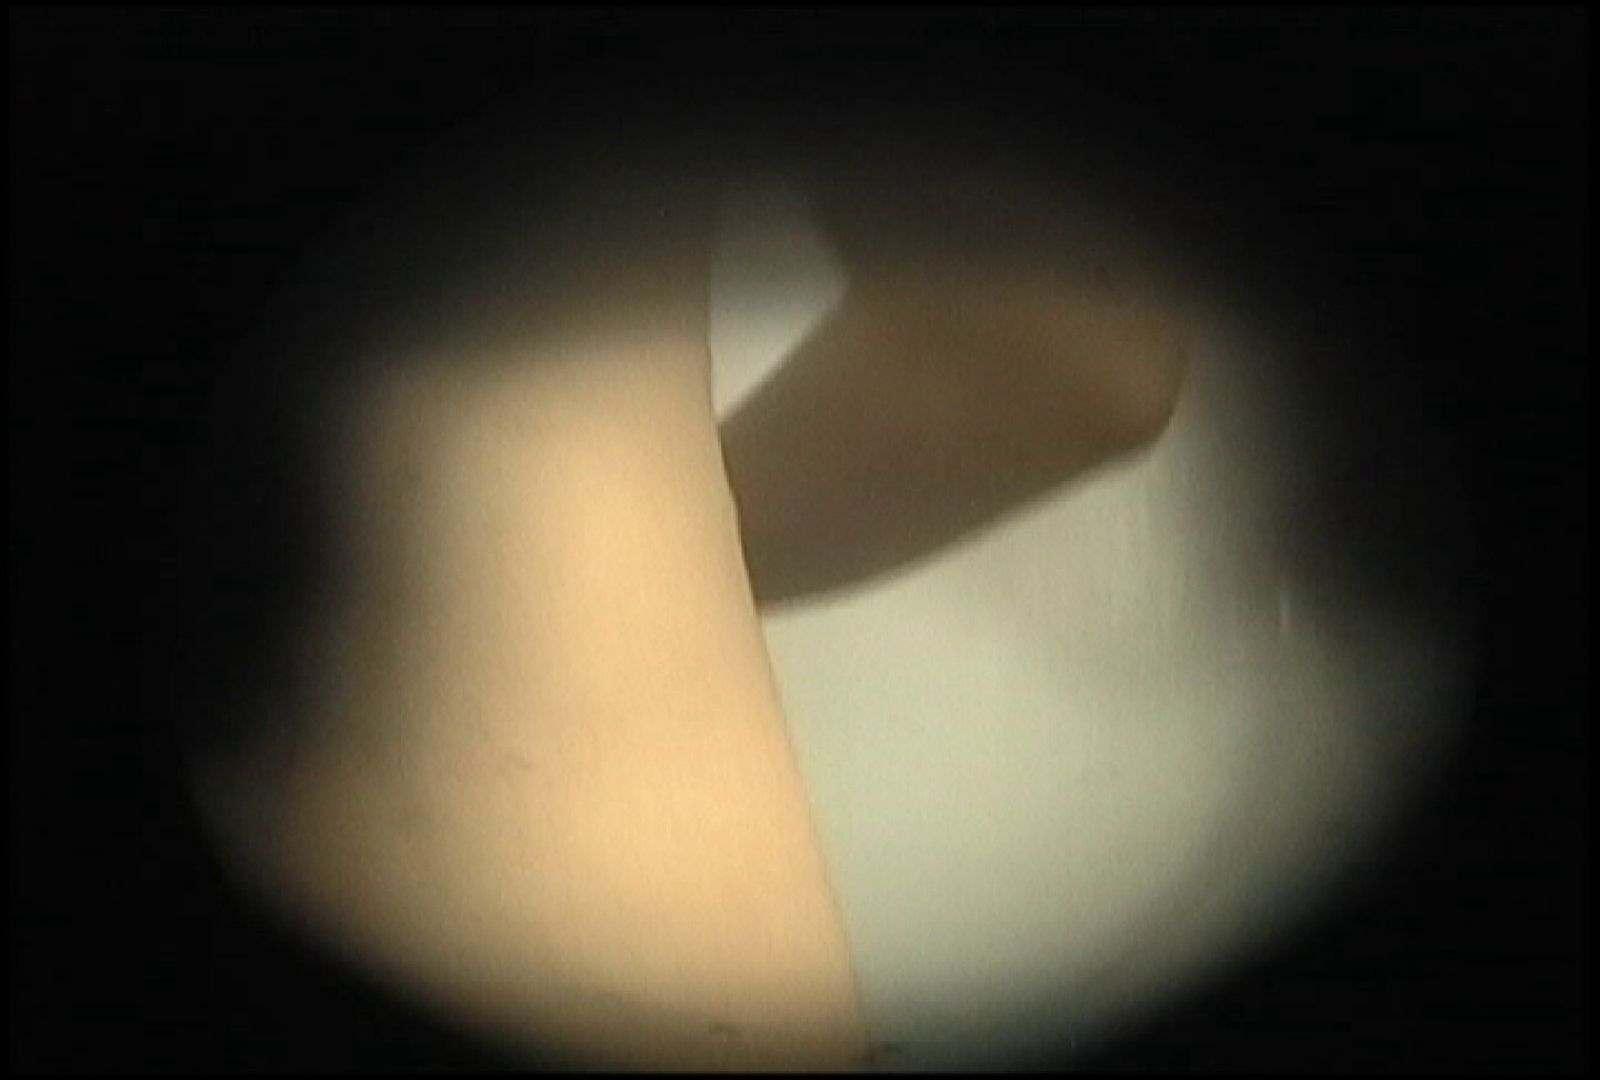 No.132 蜘蛛の糸よろしくプラプラ垂れる紐を望むお尻を シャワー すけべAV動画紹介 27画像 16